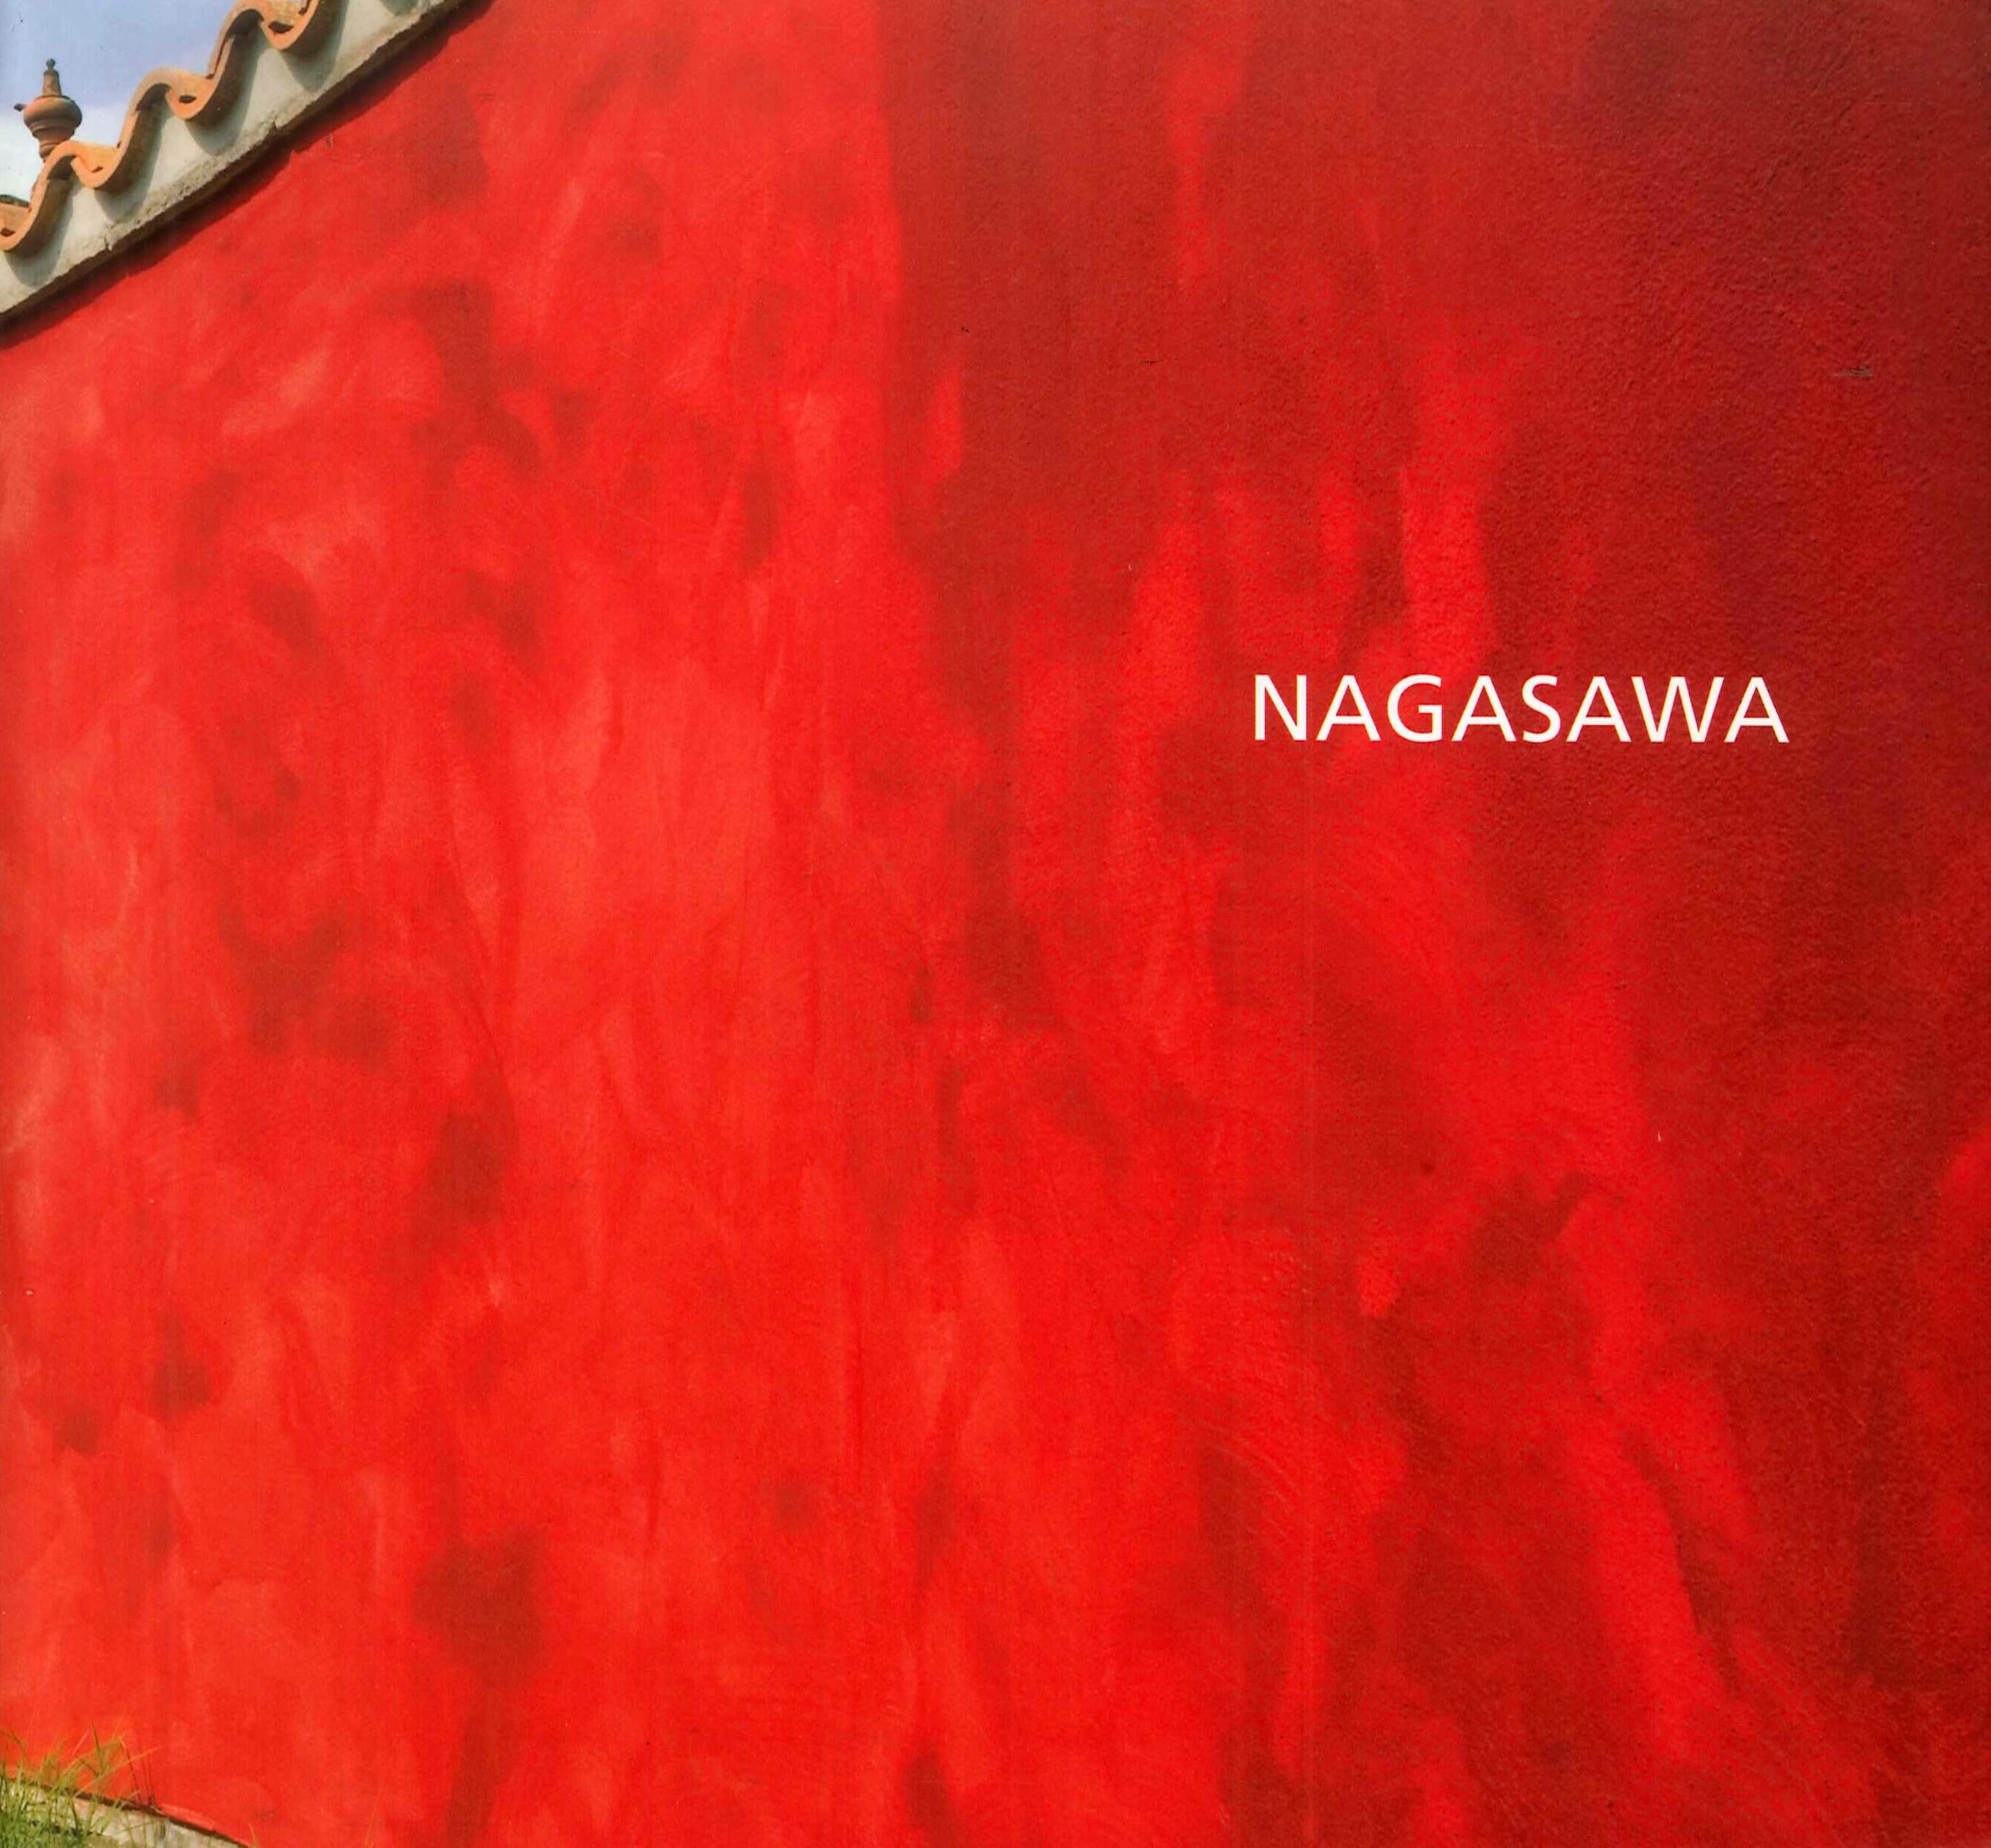 Nagasawa, il giardino rovesciato. Ediz. italiana e inglese